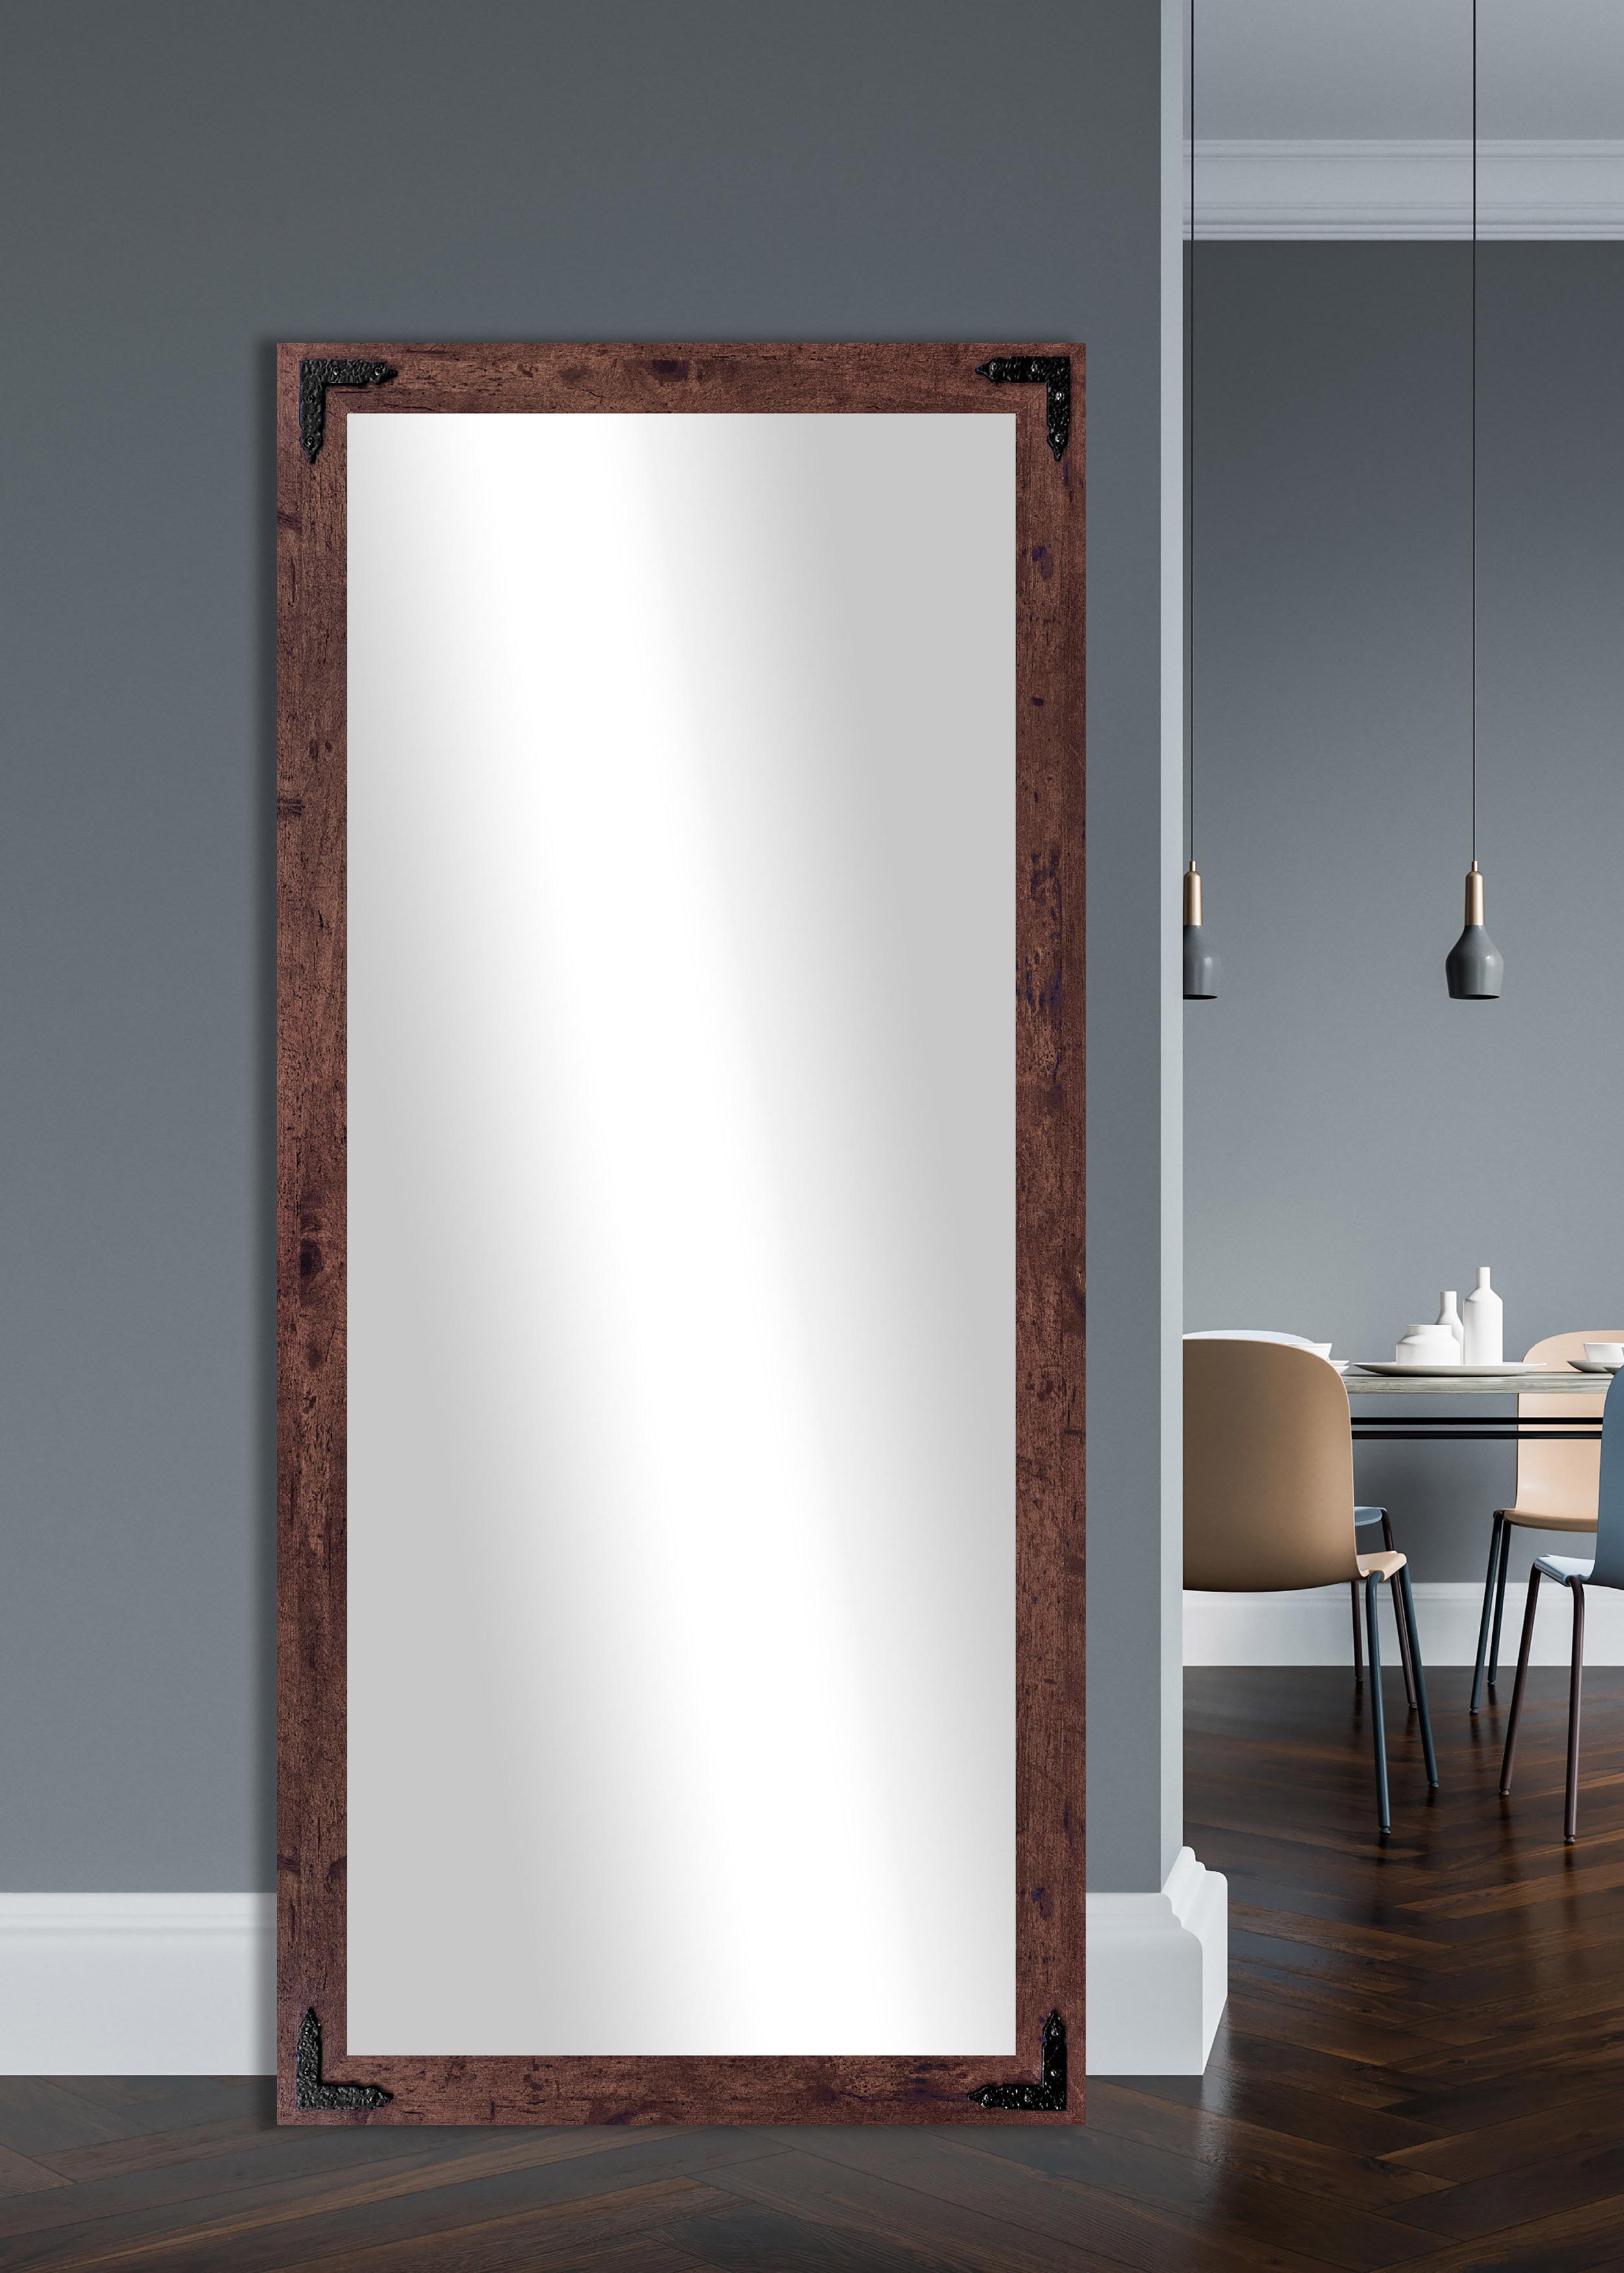 Dumais Full Length Mirror Inside 2019 Full Length Decorative Wall Mirrors (View 20 of 20)